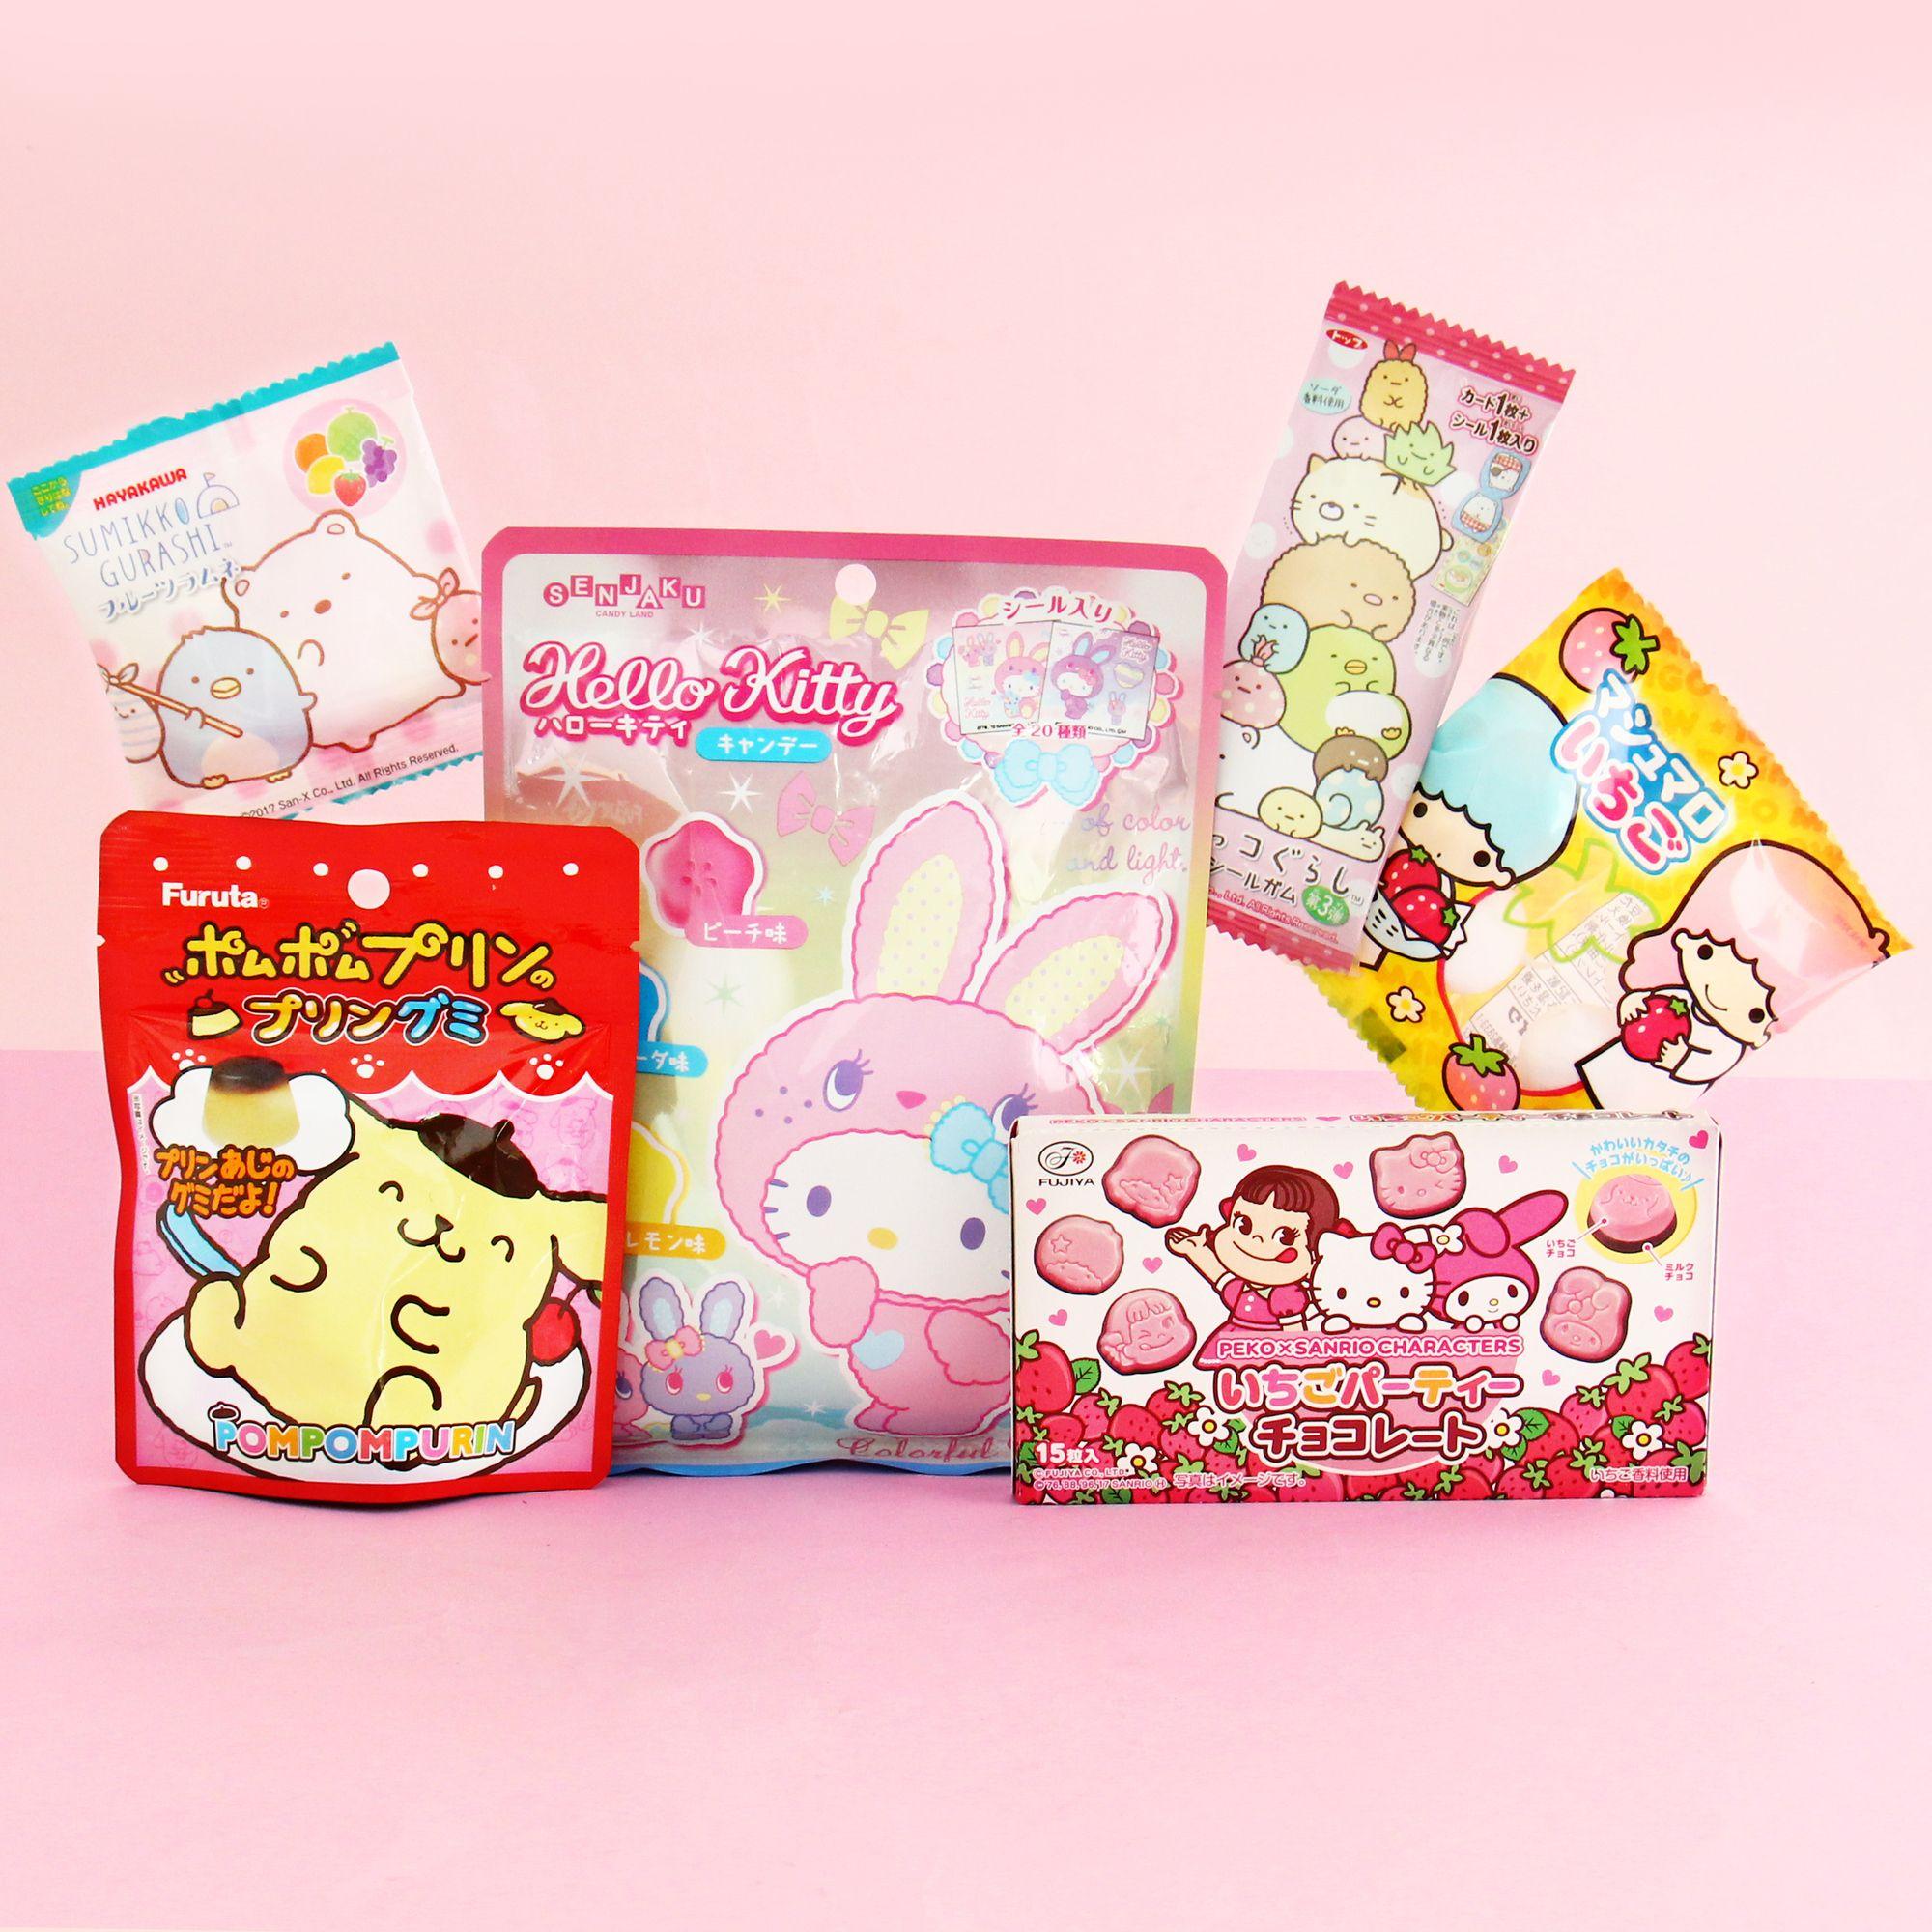 KAWAII from Japan 10 pieces Moomin Seethrough bag S